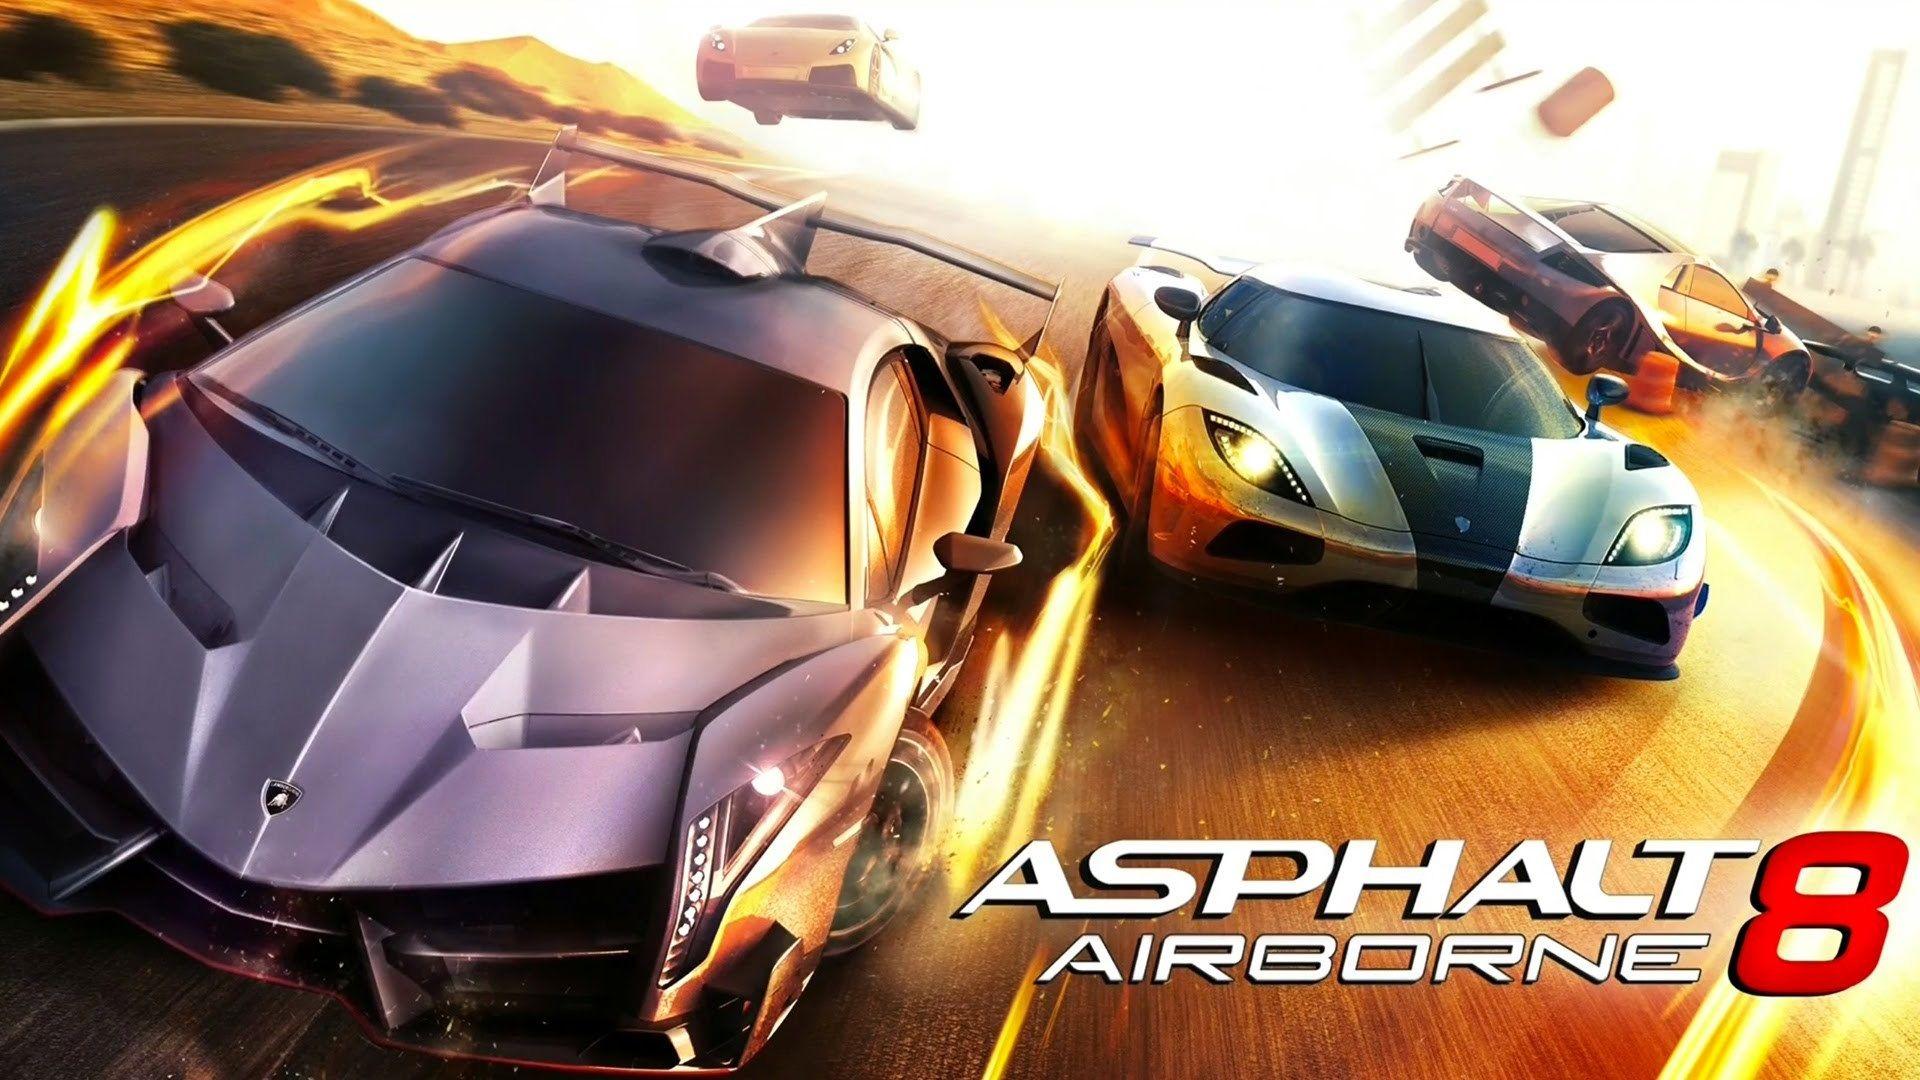 821b161af0c62ecf55c8370696092c95 Marvelous Lamborghini Huracan Hack asphalt 8 Cars Trend